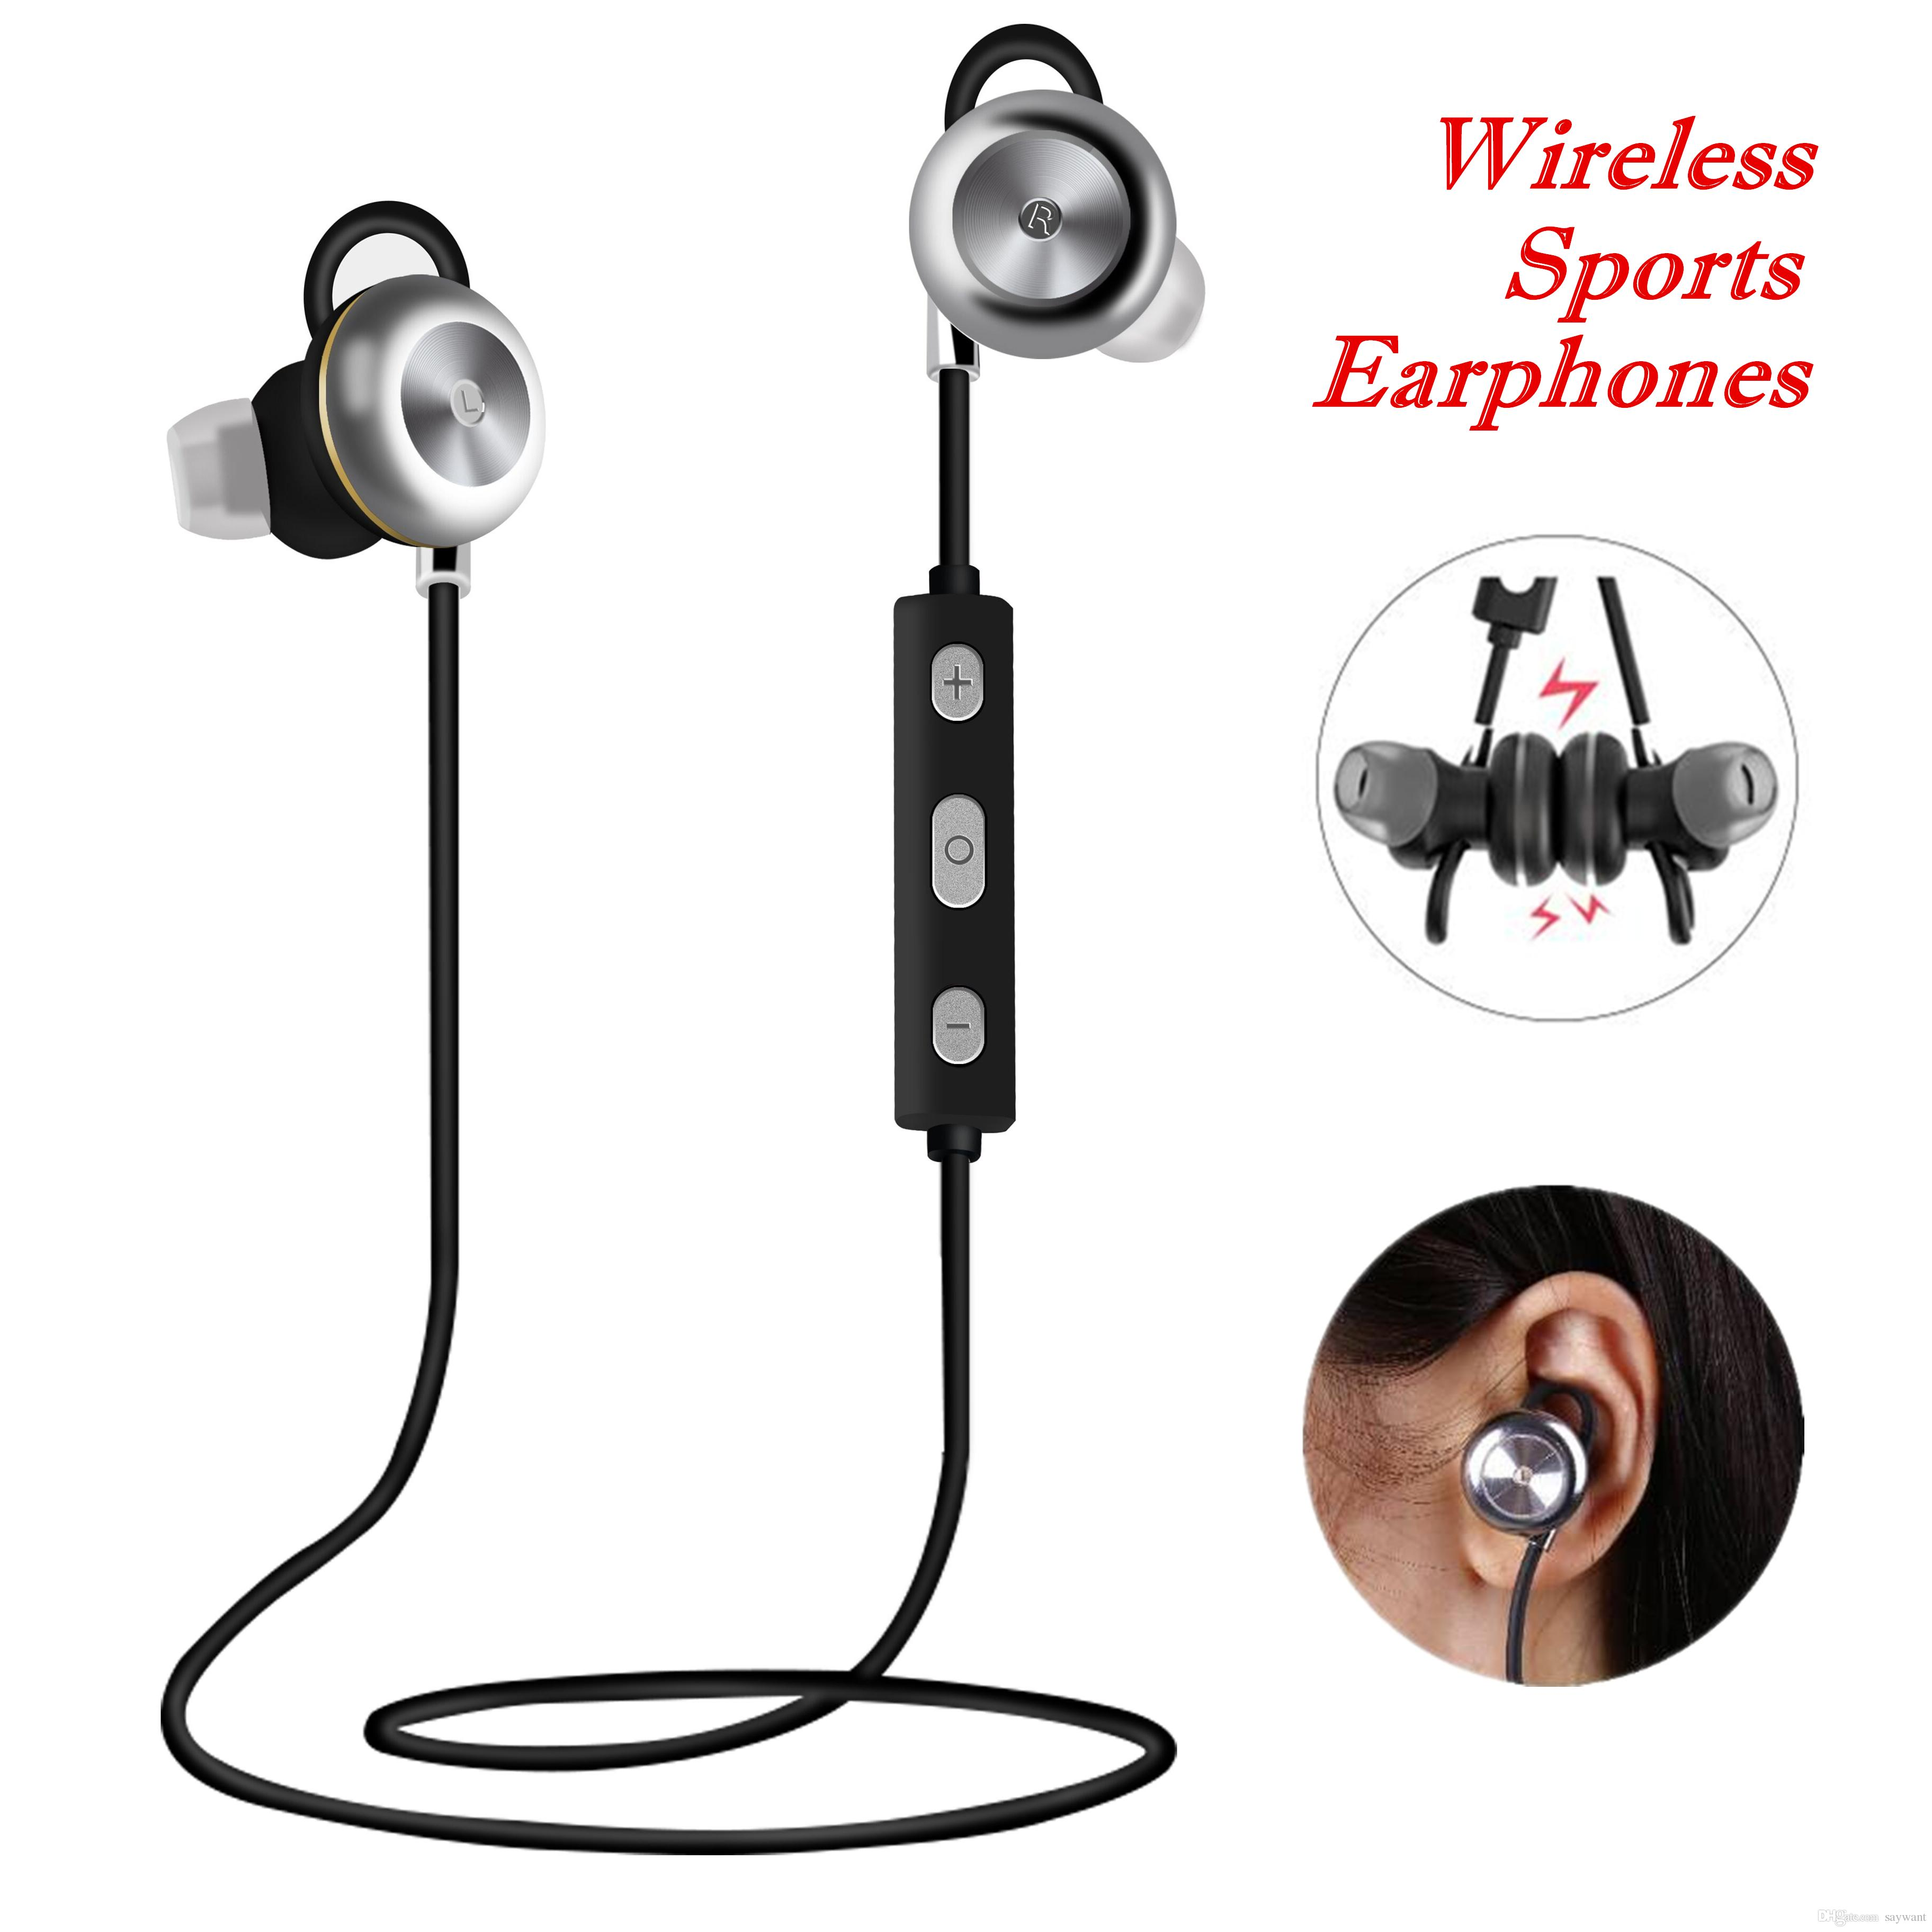 CSR 4.1 سماعات الرياضة اللاسلكية X9 Neckband المحمولة إلغاء الضوضاء سماعات ستيريو سماعة في الأذن ميكروفون تشغيل بلوتوث 4.0